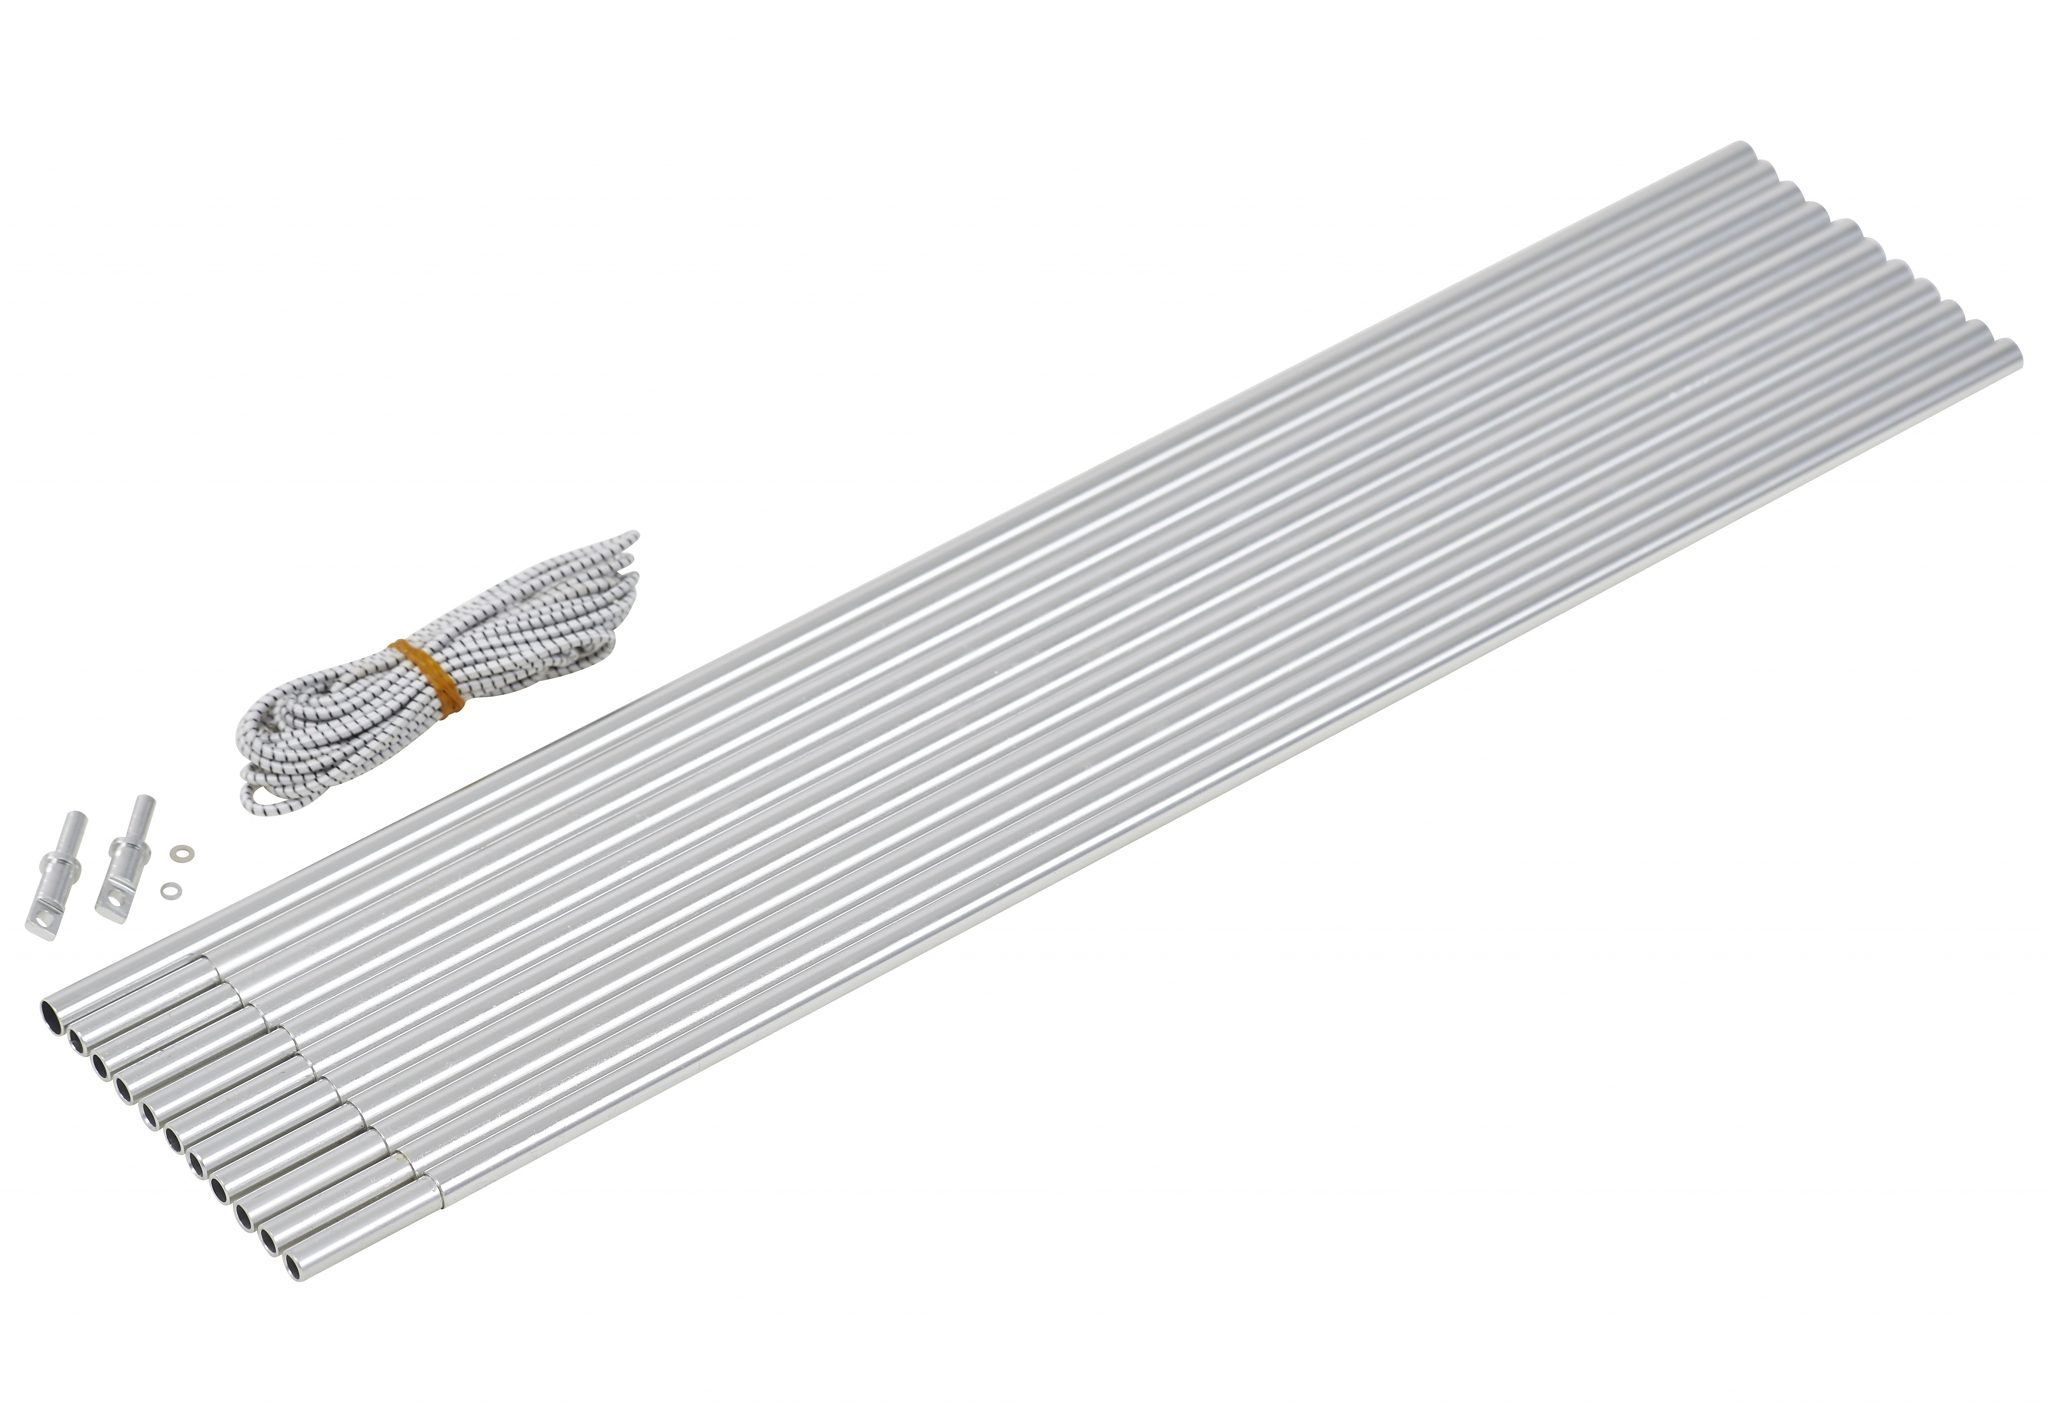 CAMPZ Zeltzubehör »Bogengestänge Alu 9,5mm/5,0m«